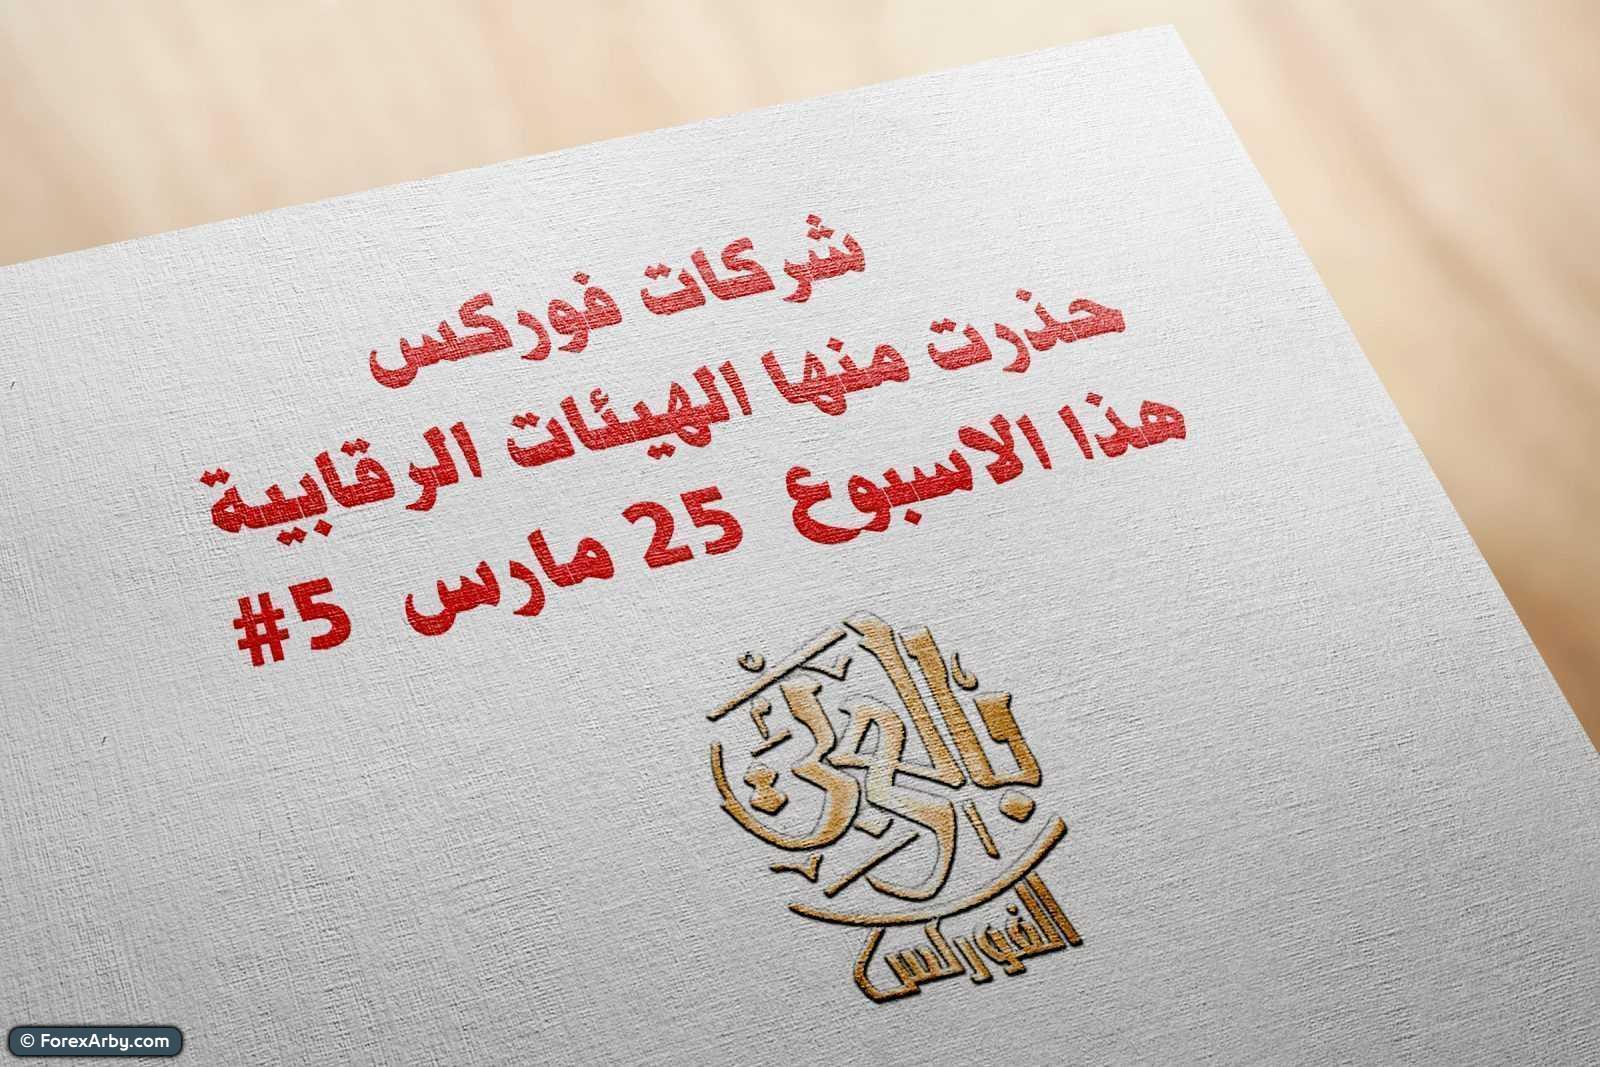 Free Linen Effect Card Logo Mockup - شركات فوركس حذرت منها الهيئات الرقابية هذا الاسبوع #5 (25 مارس 2019)